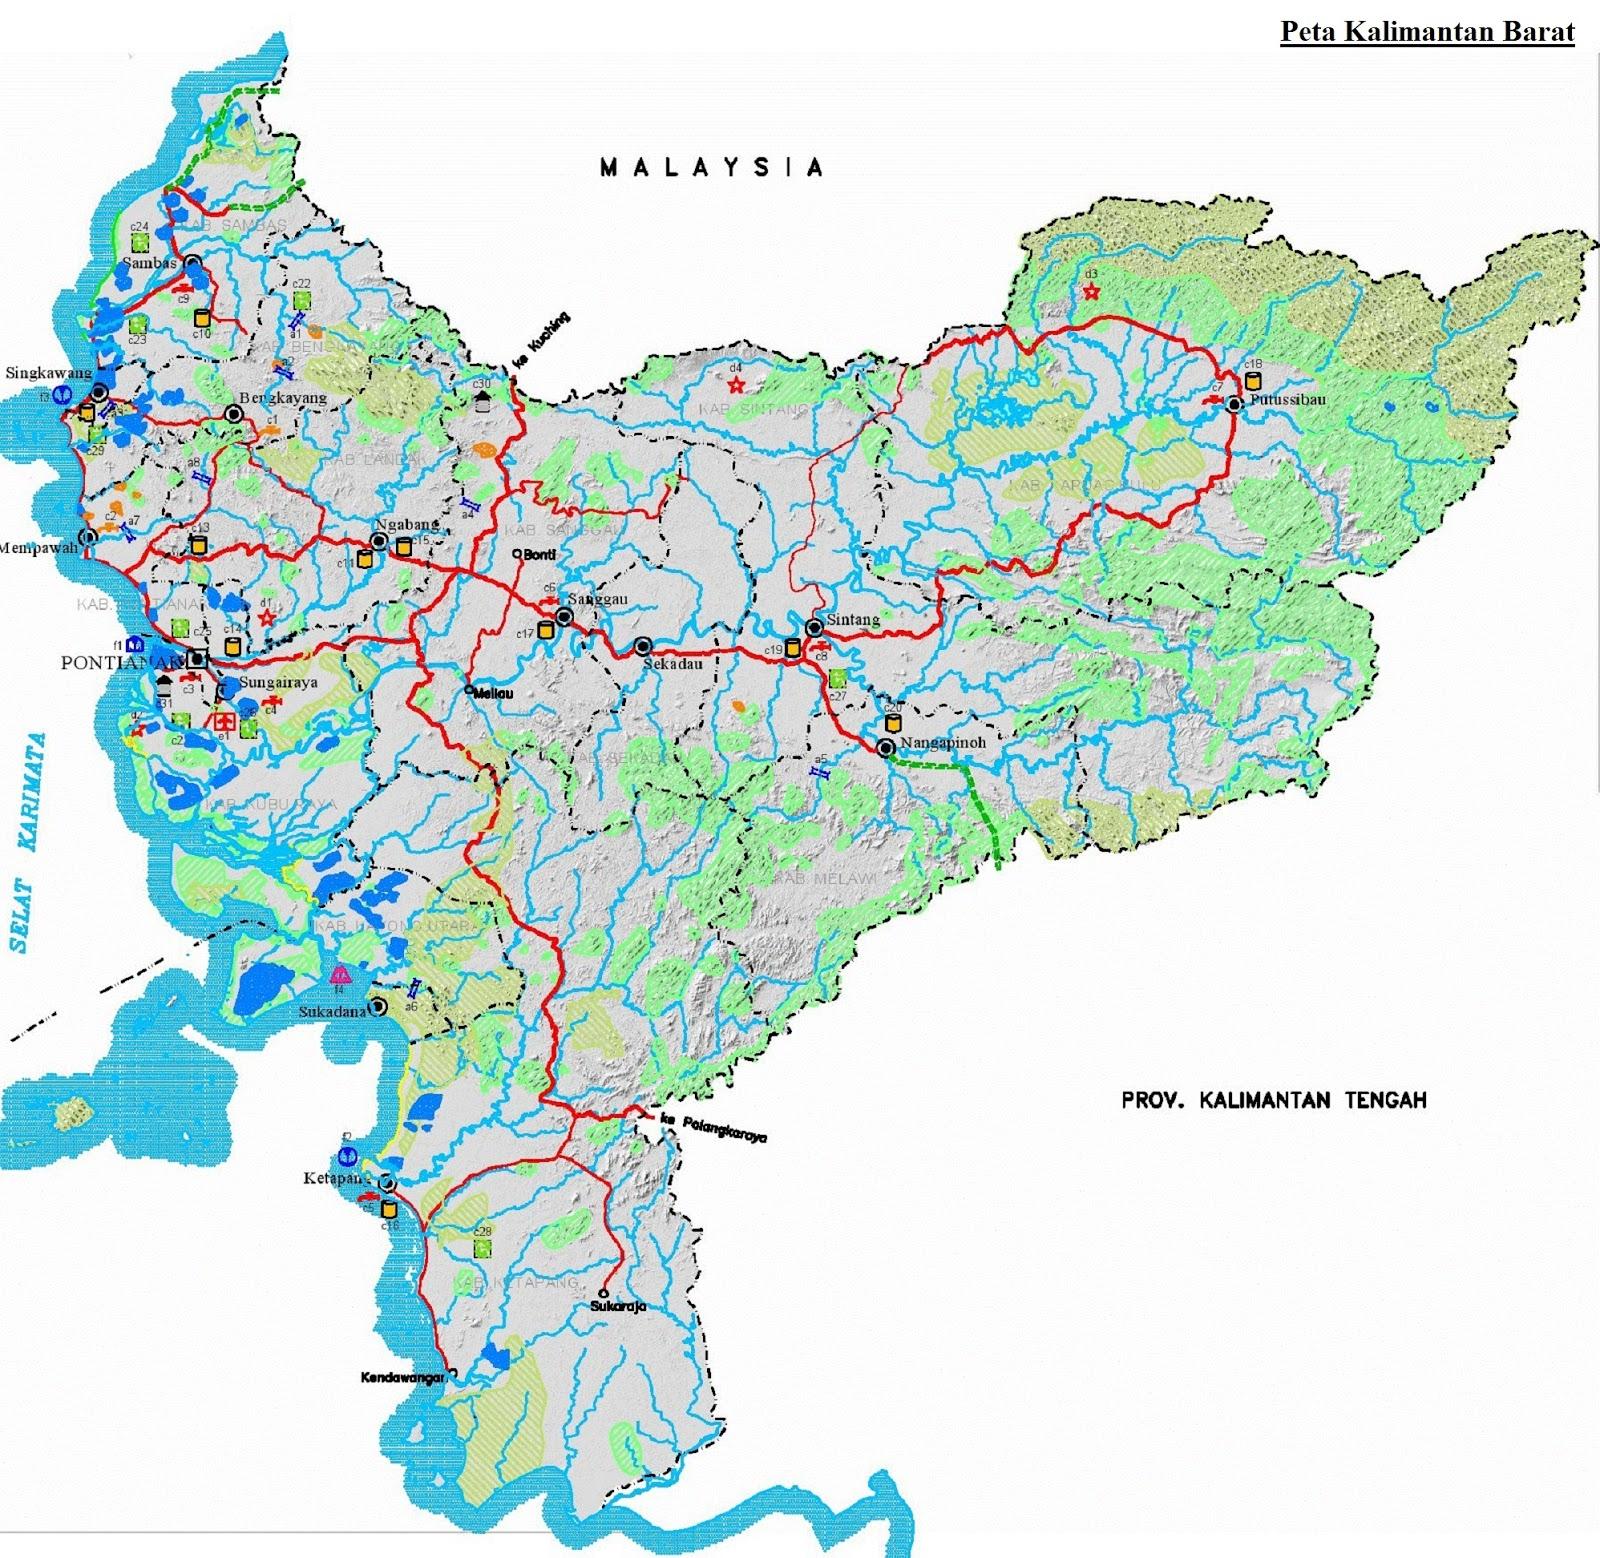 Peta Kalimantan Barat HD